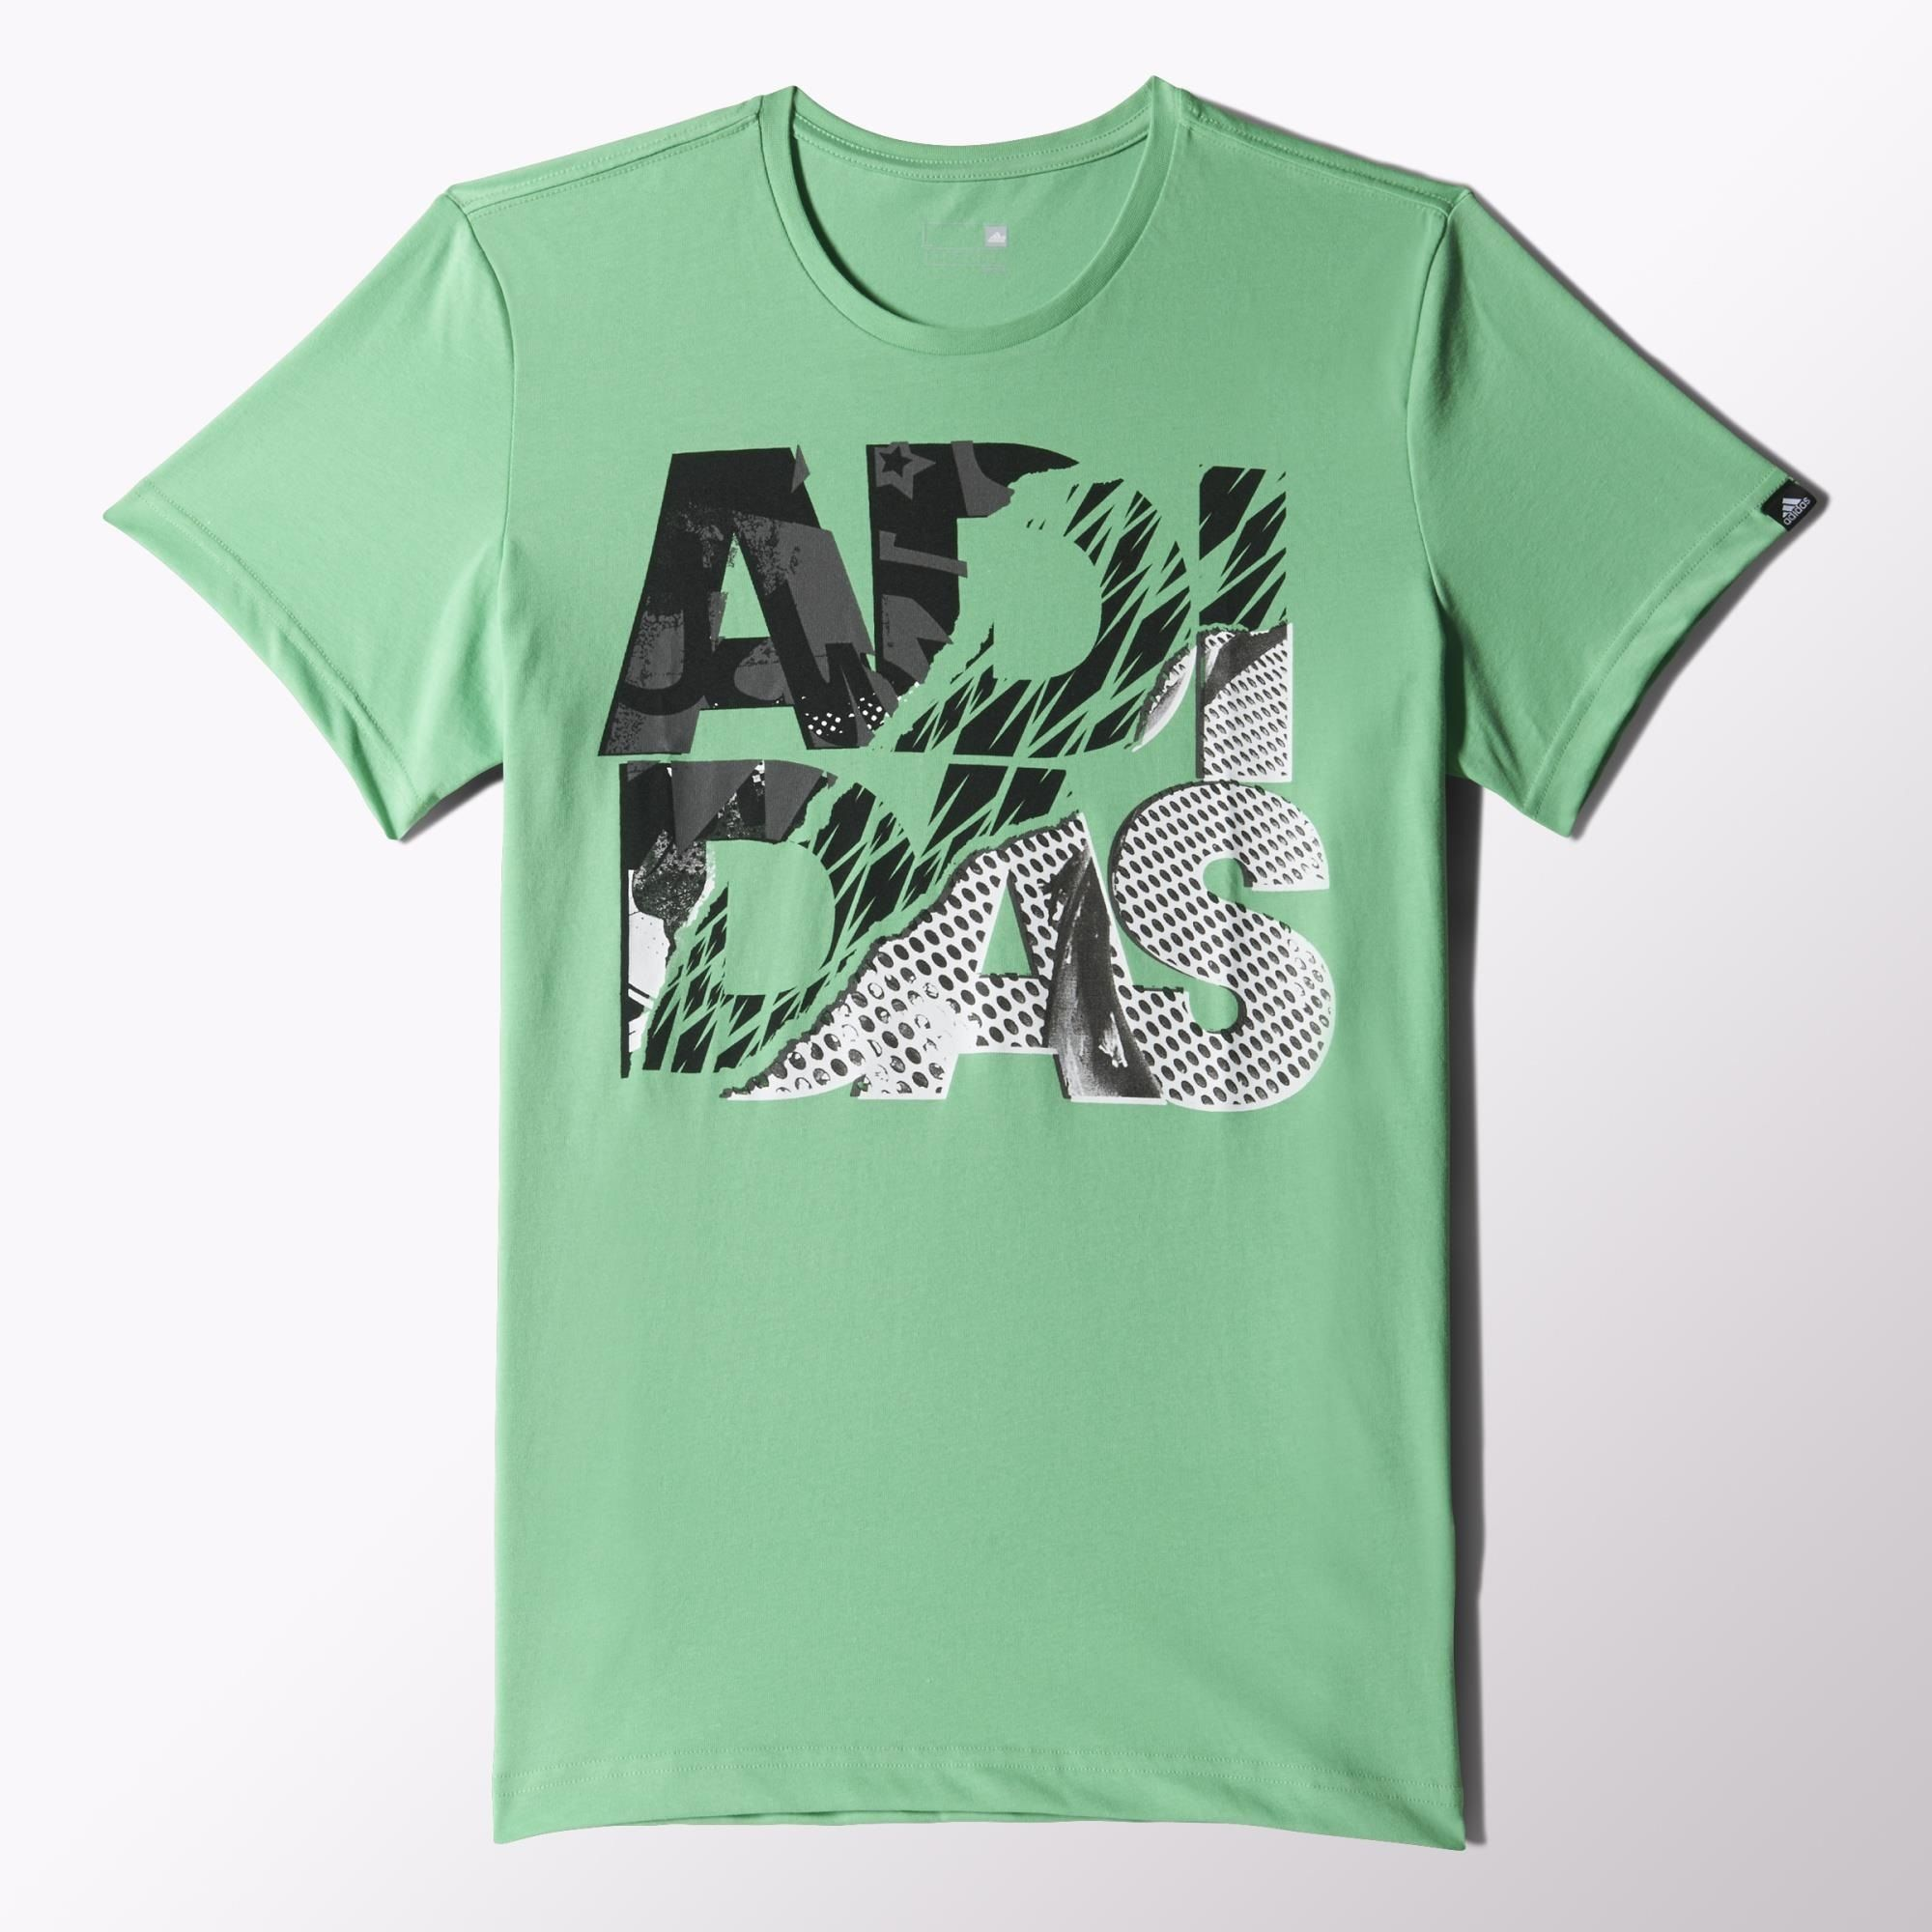 Herren T-Shirt 90s lineage t-shirt, SEFLGR, S